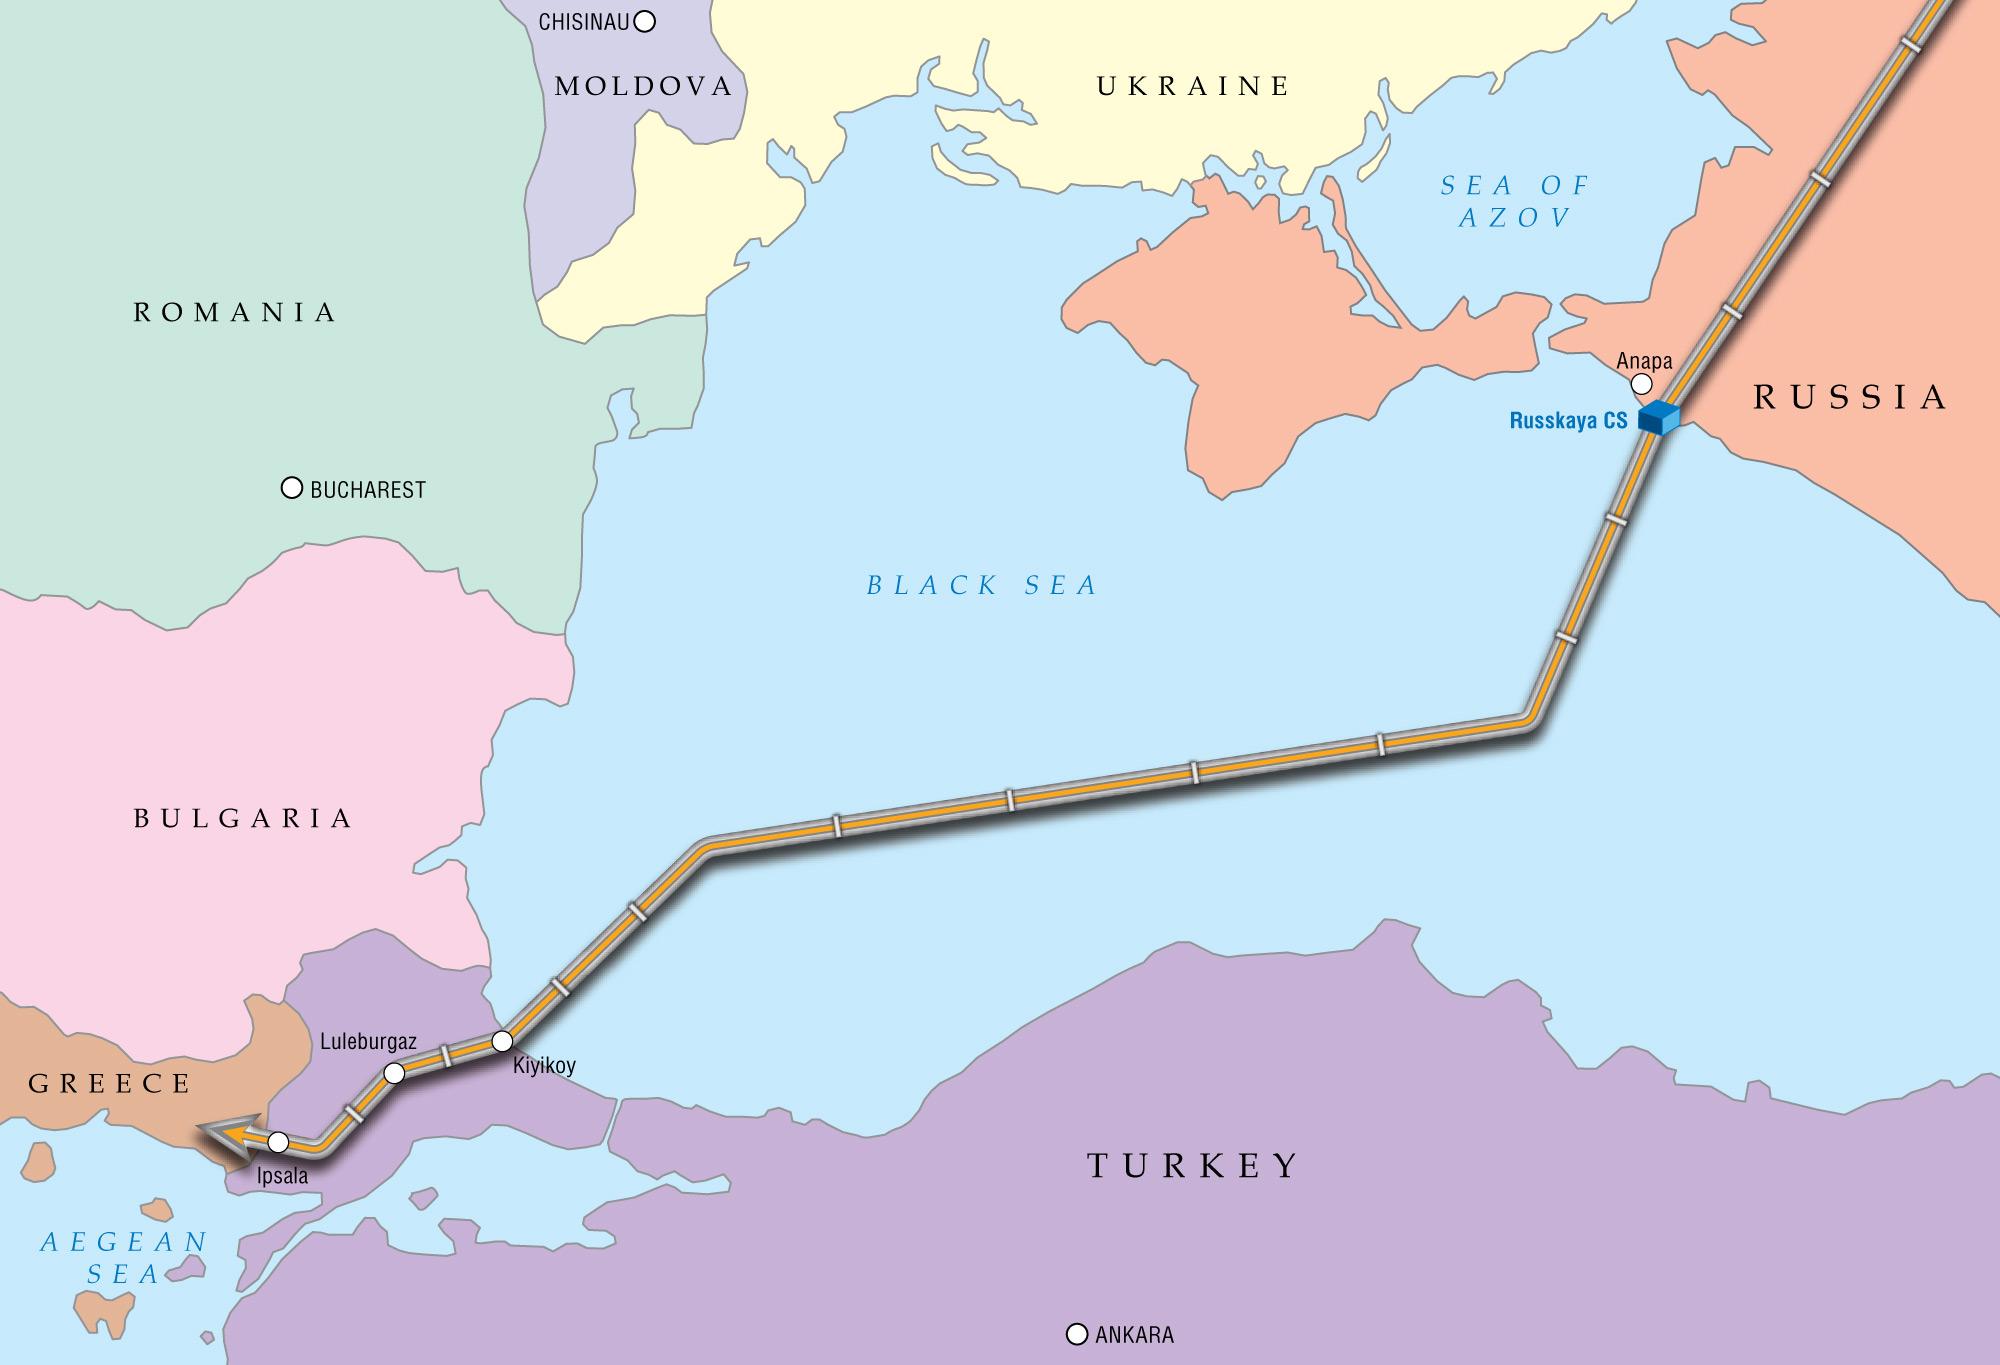 Russia's Gazprom Receives License from Turkey to Build Under Water of Turkish Stream